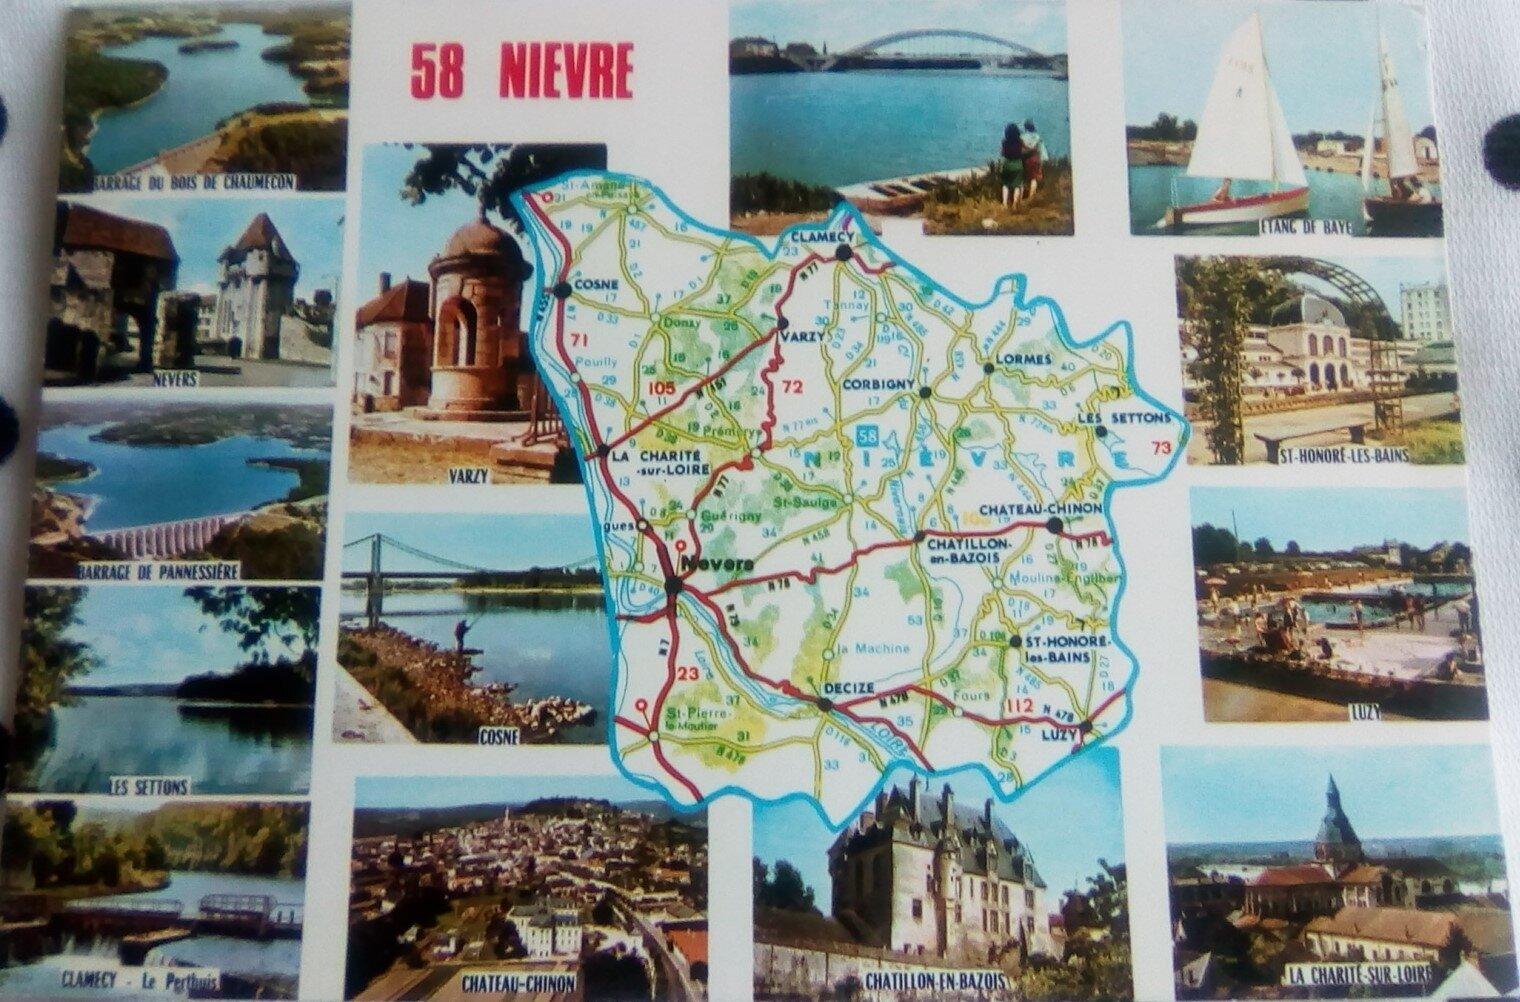 00 Nièvre